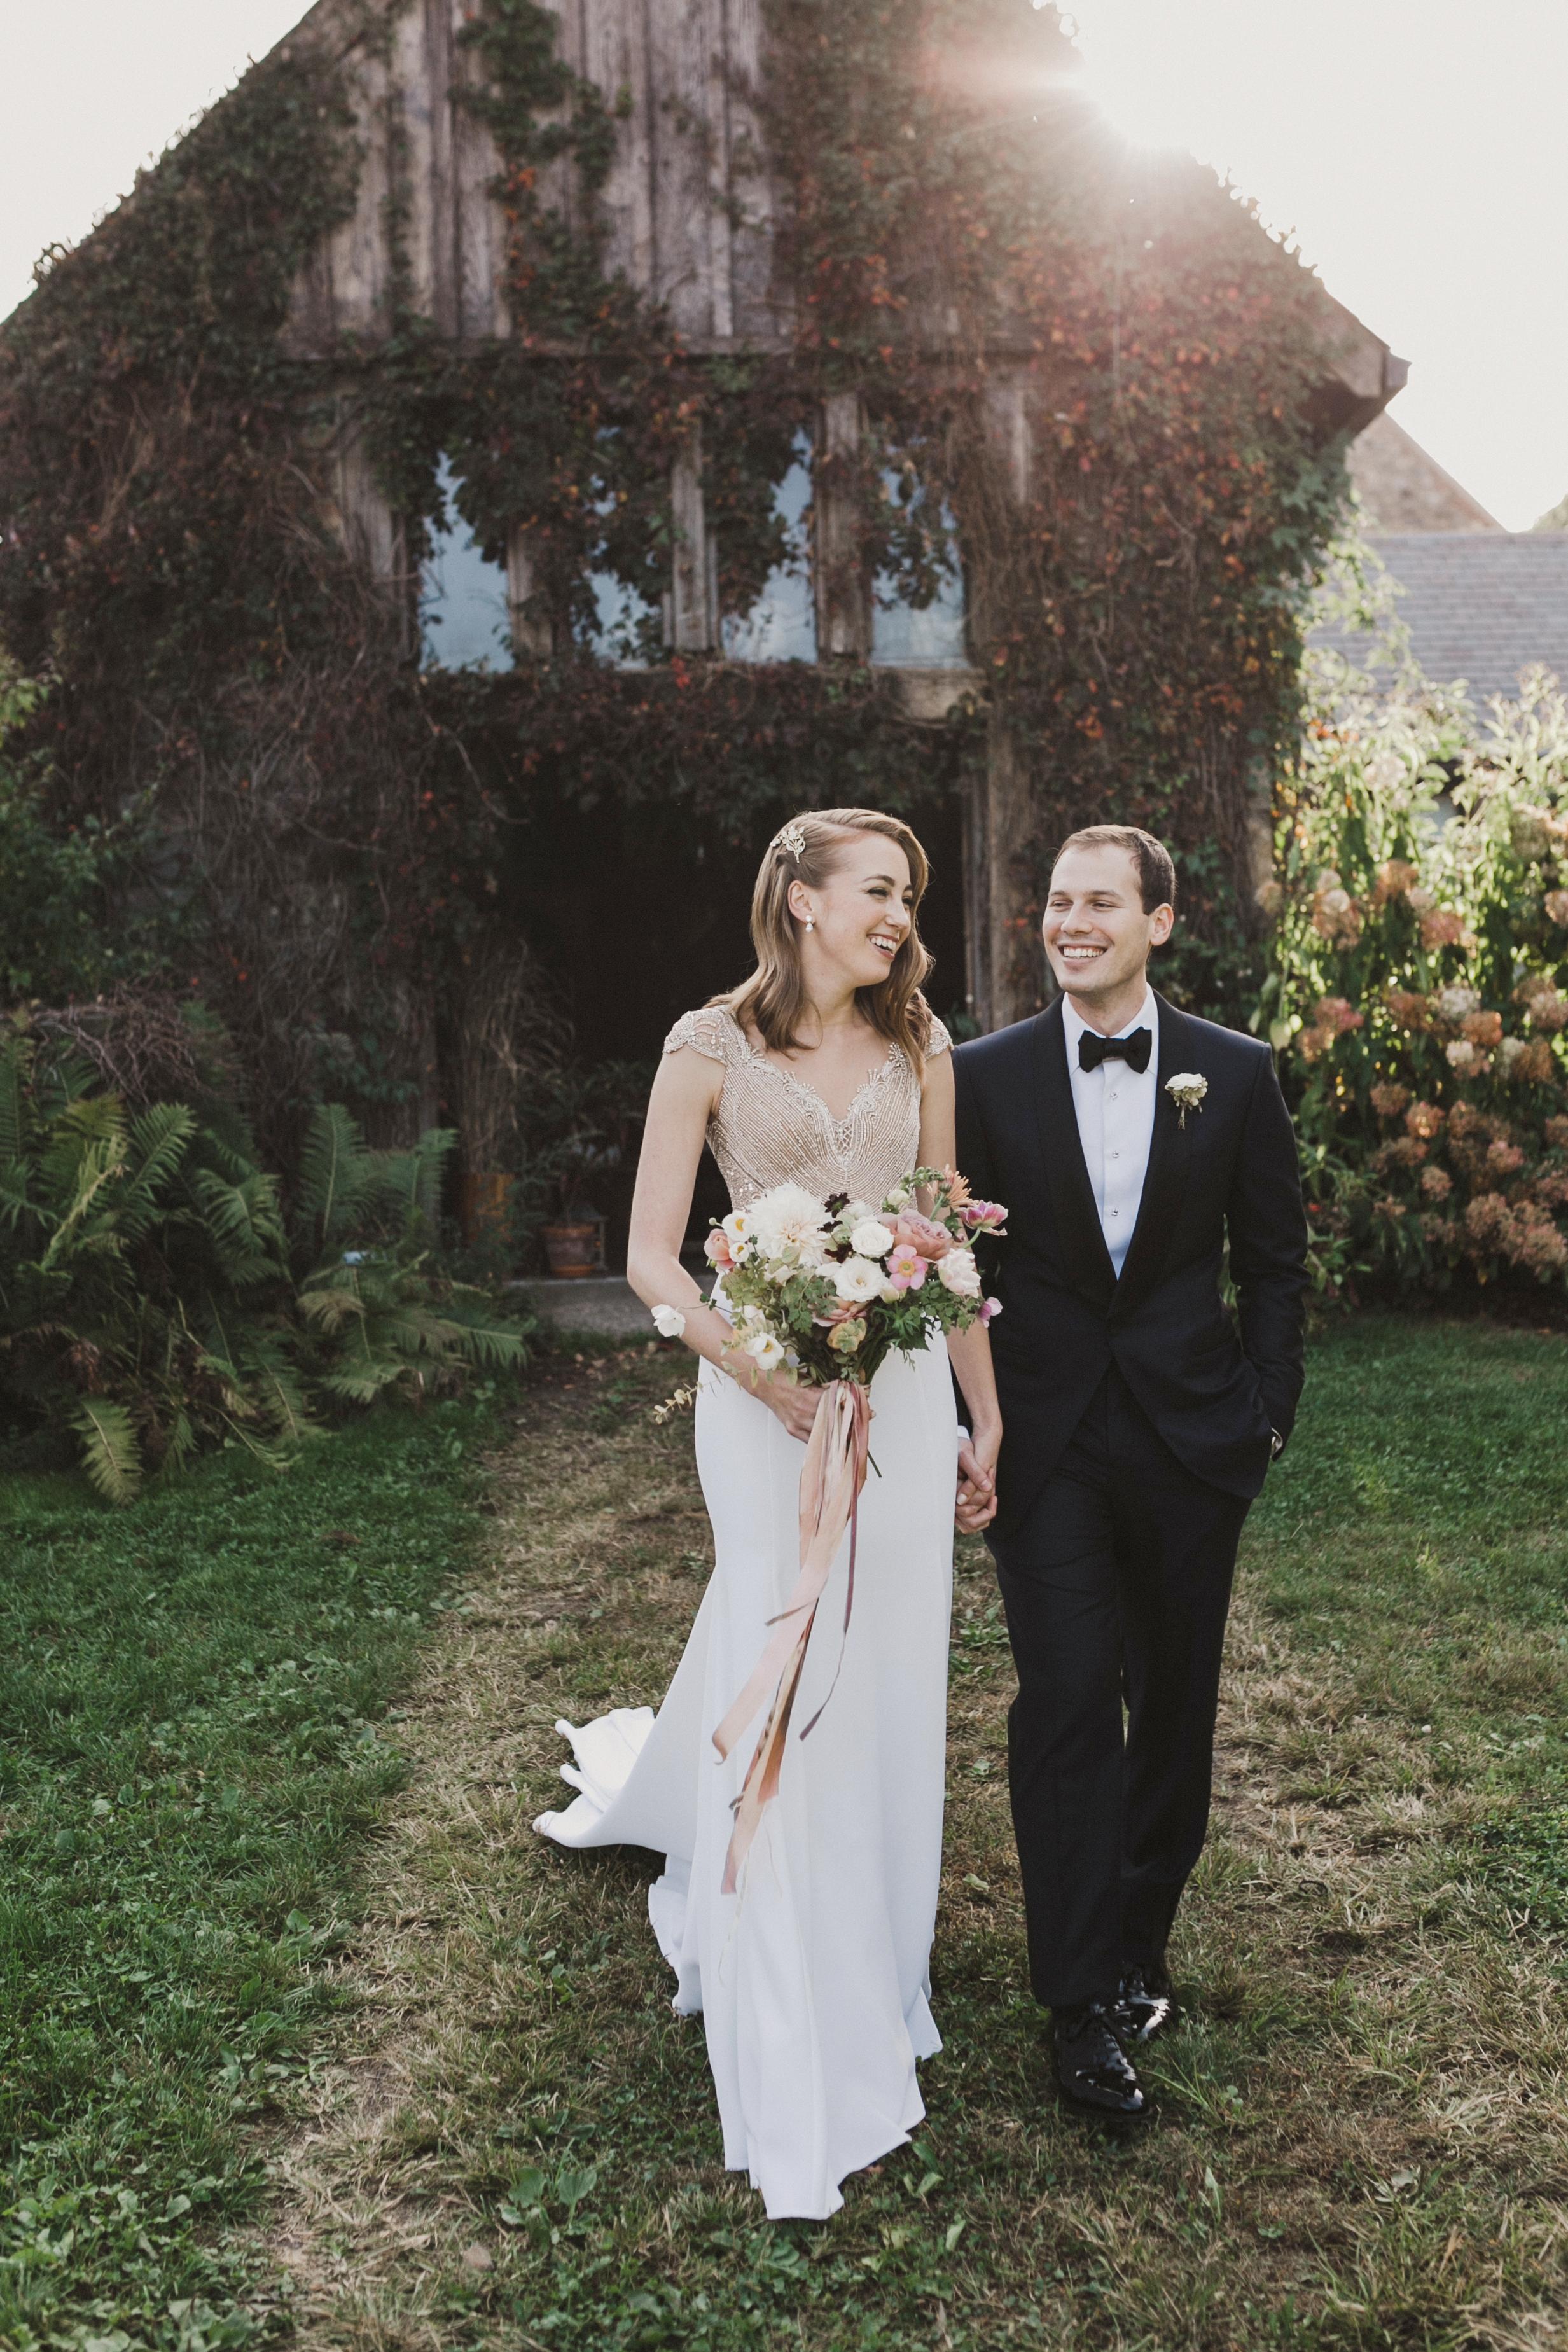 Grace & Jared